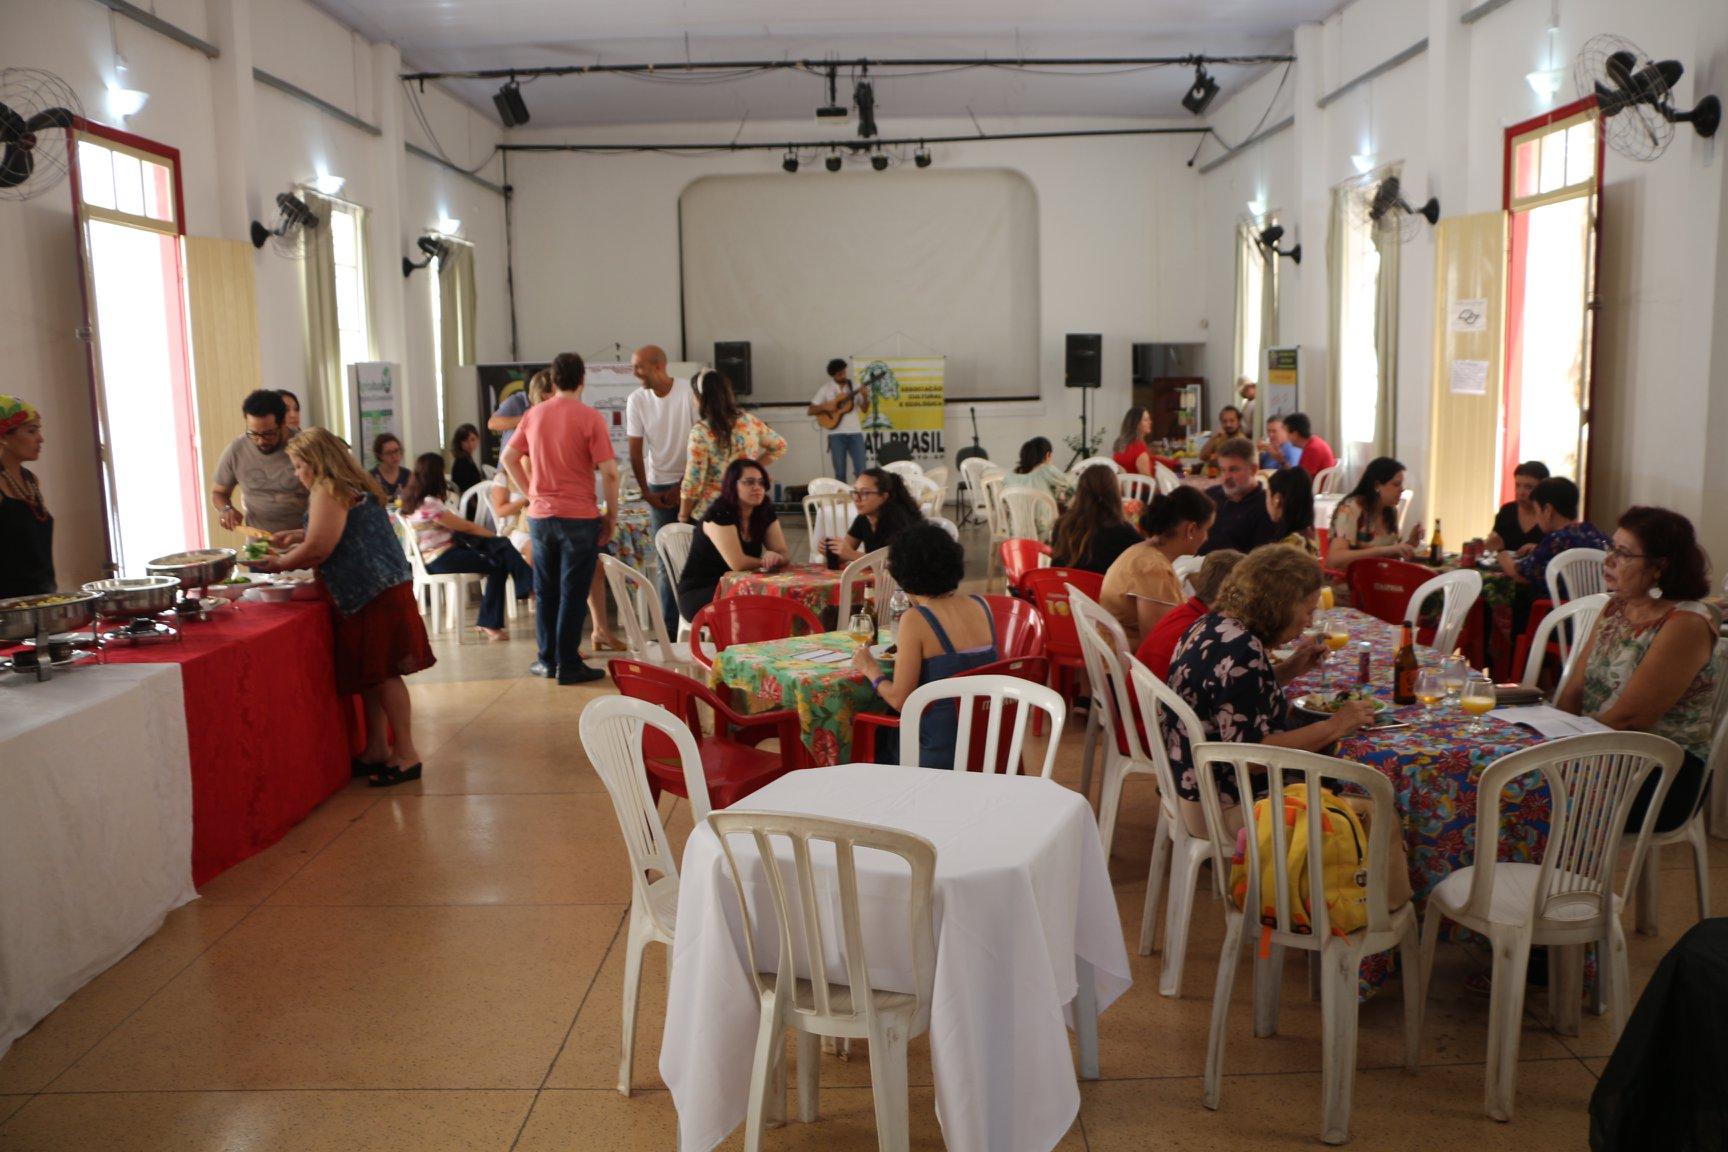 Bons encontros no Almoço Cultural Vegetariano